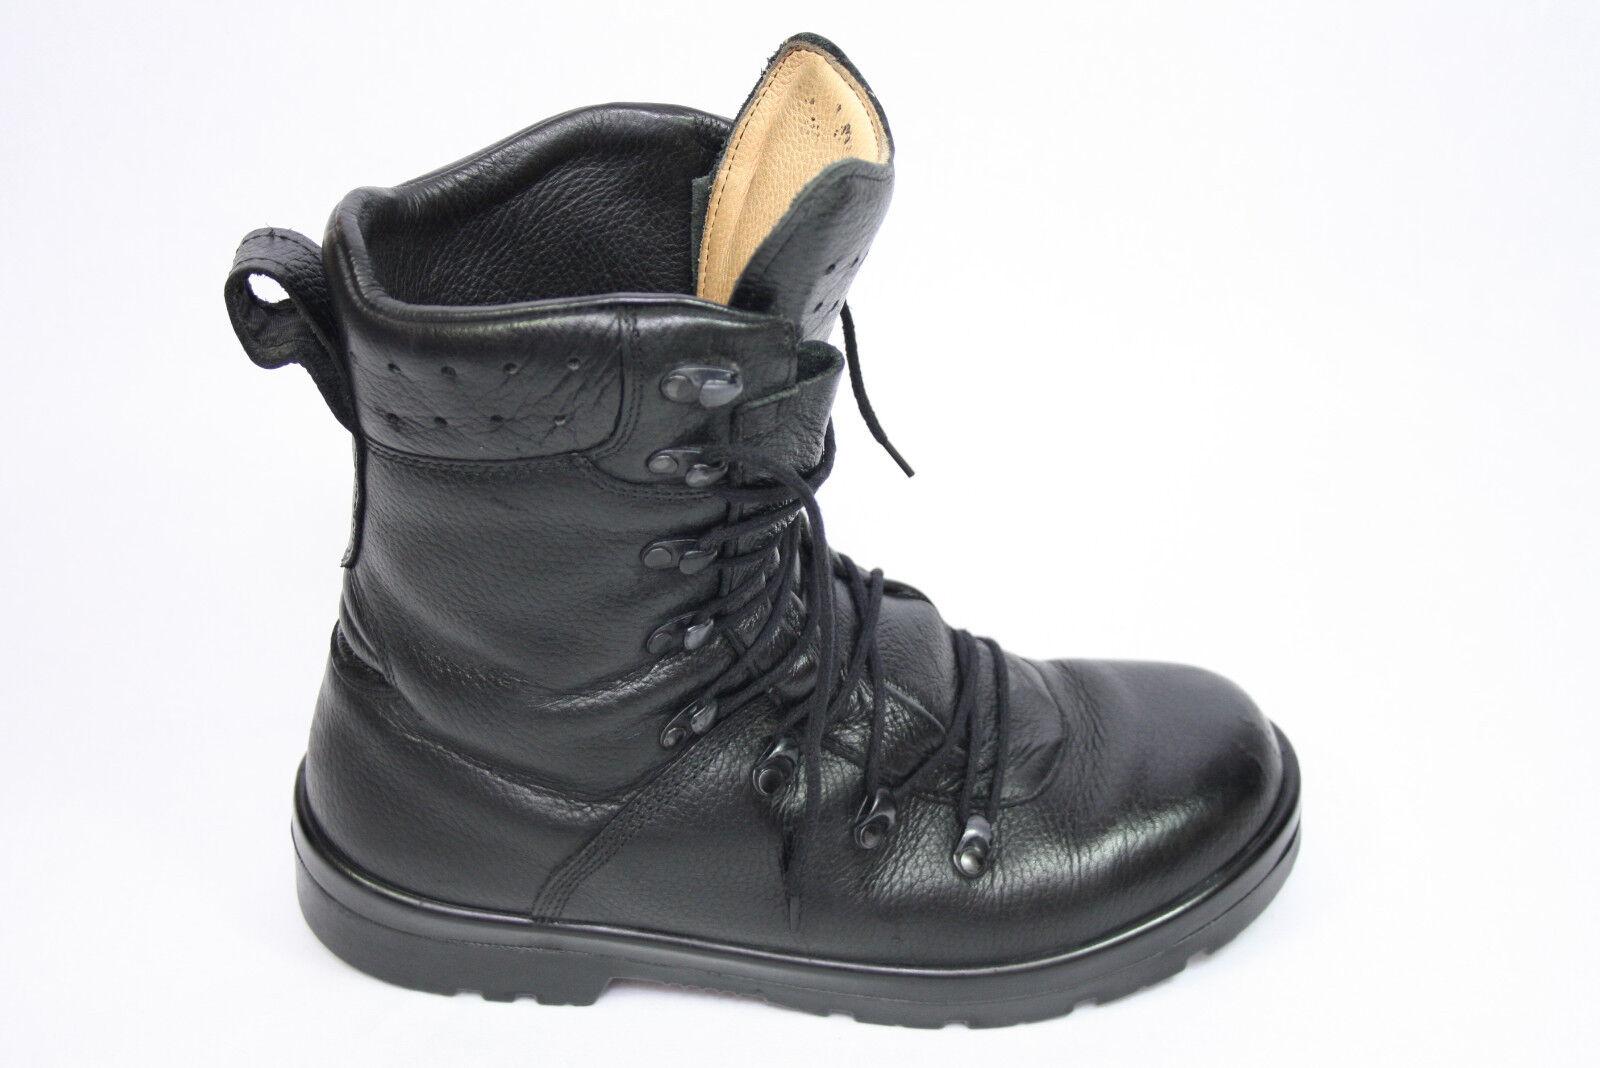 Bw Original Stiefel Kampfstiefel Bw Bw Original Kampfstiefel Kampfstiefel Stiefel Stiefel Original zpVSUM